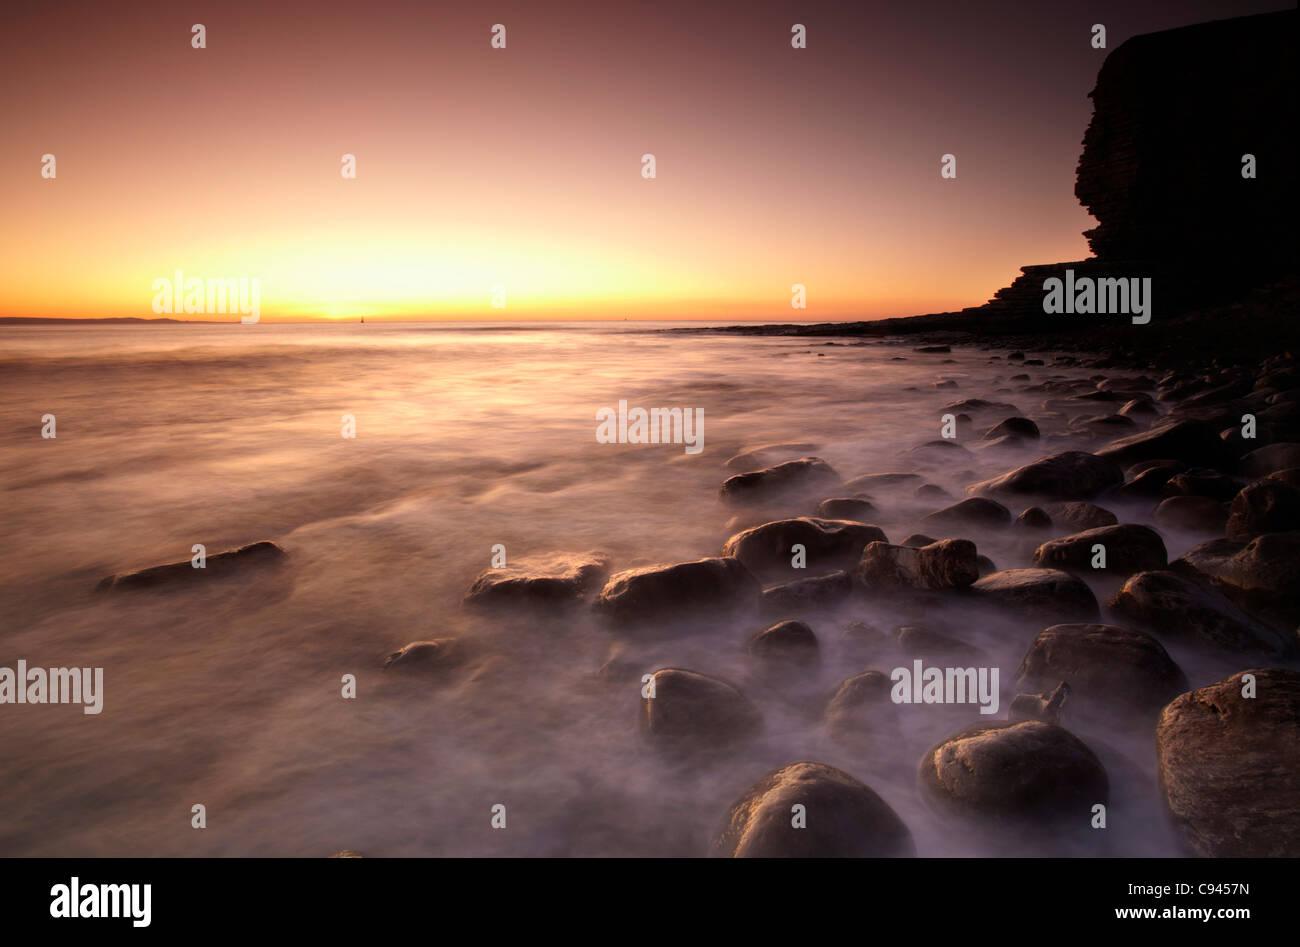 Sunset at Nash Point, Glamorgan Heritage Coast, South Wales - Stock Image